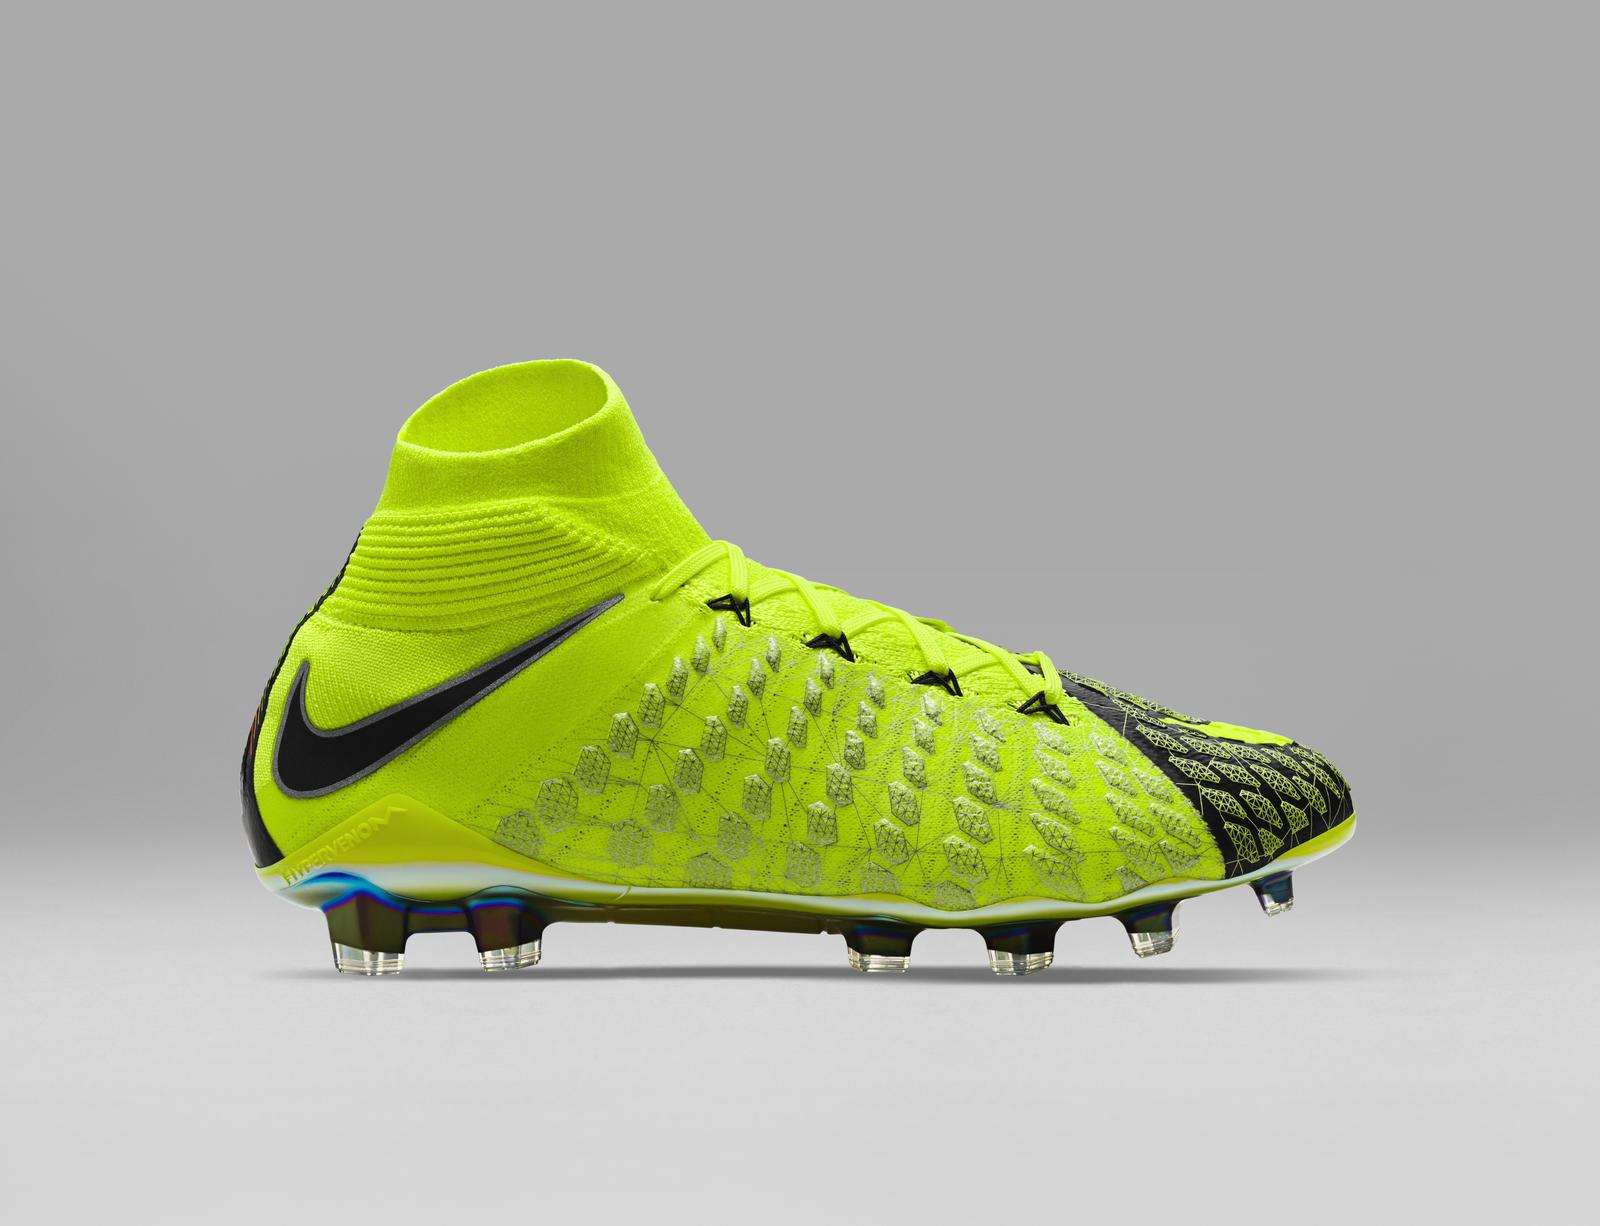 da6b13e391bc ... Click to enlarge image  nike_x_ea_sports_hypervenom_3_football_boots_c.jpg ...